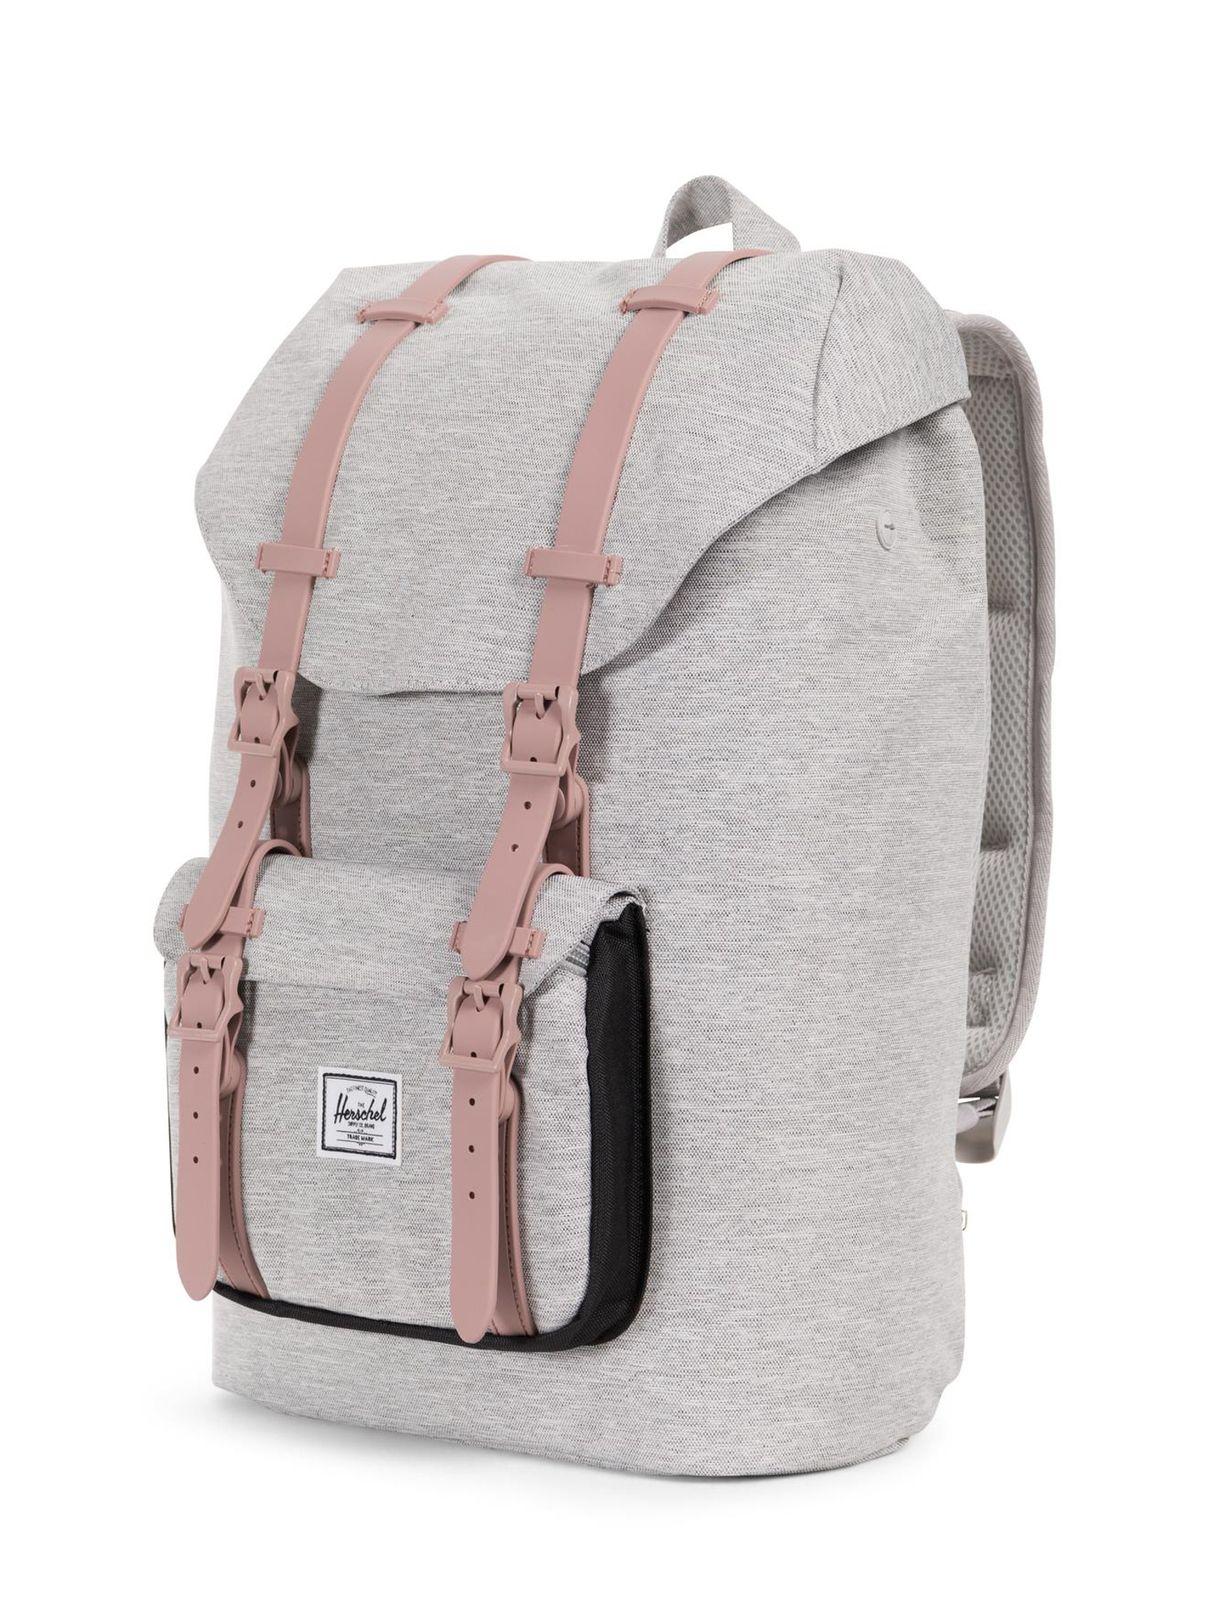 203ad950bdaee Herschel Backpack Little America Mid-Volume